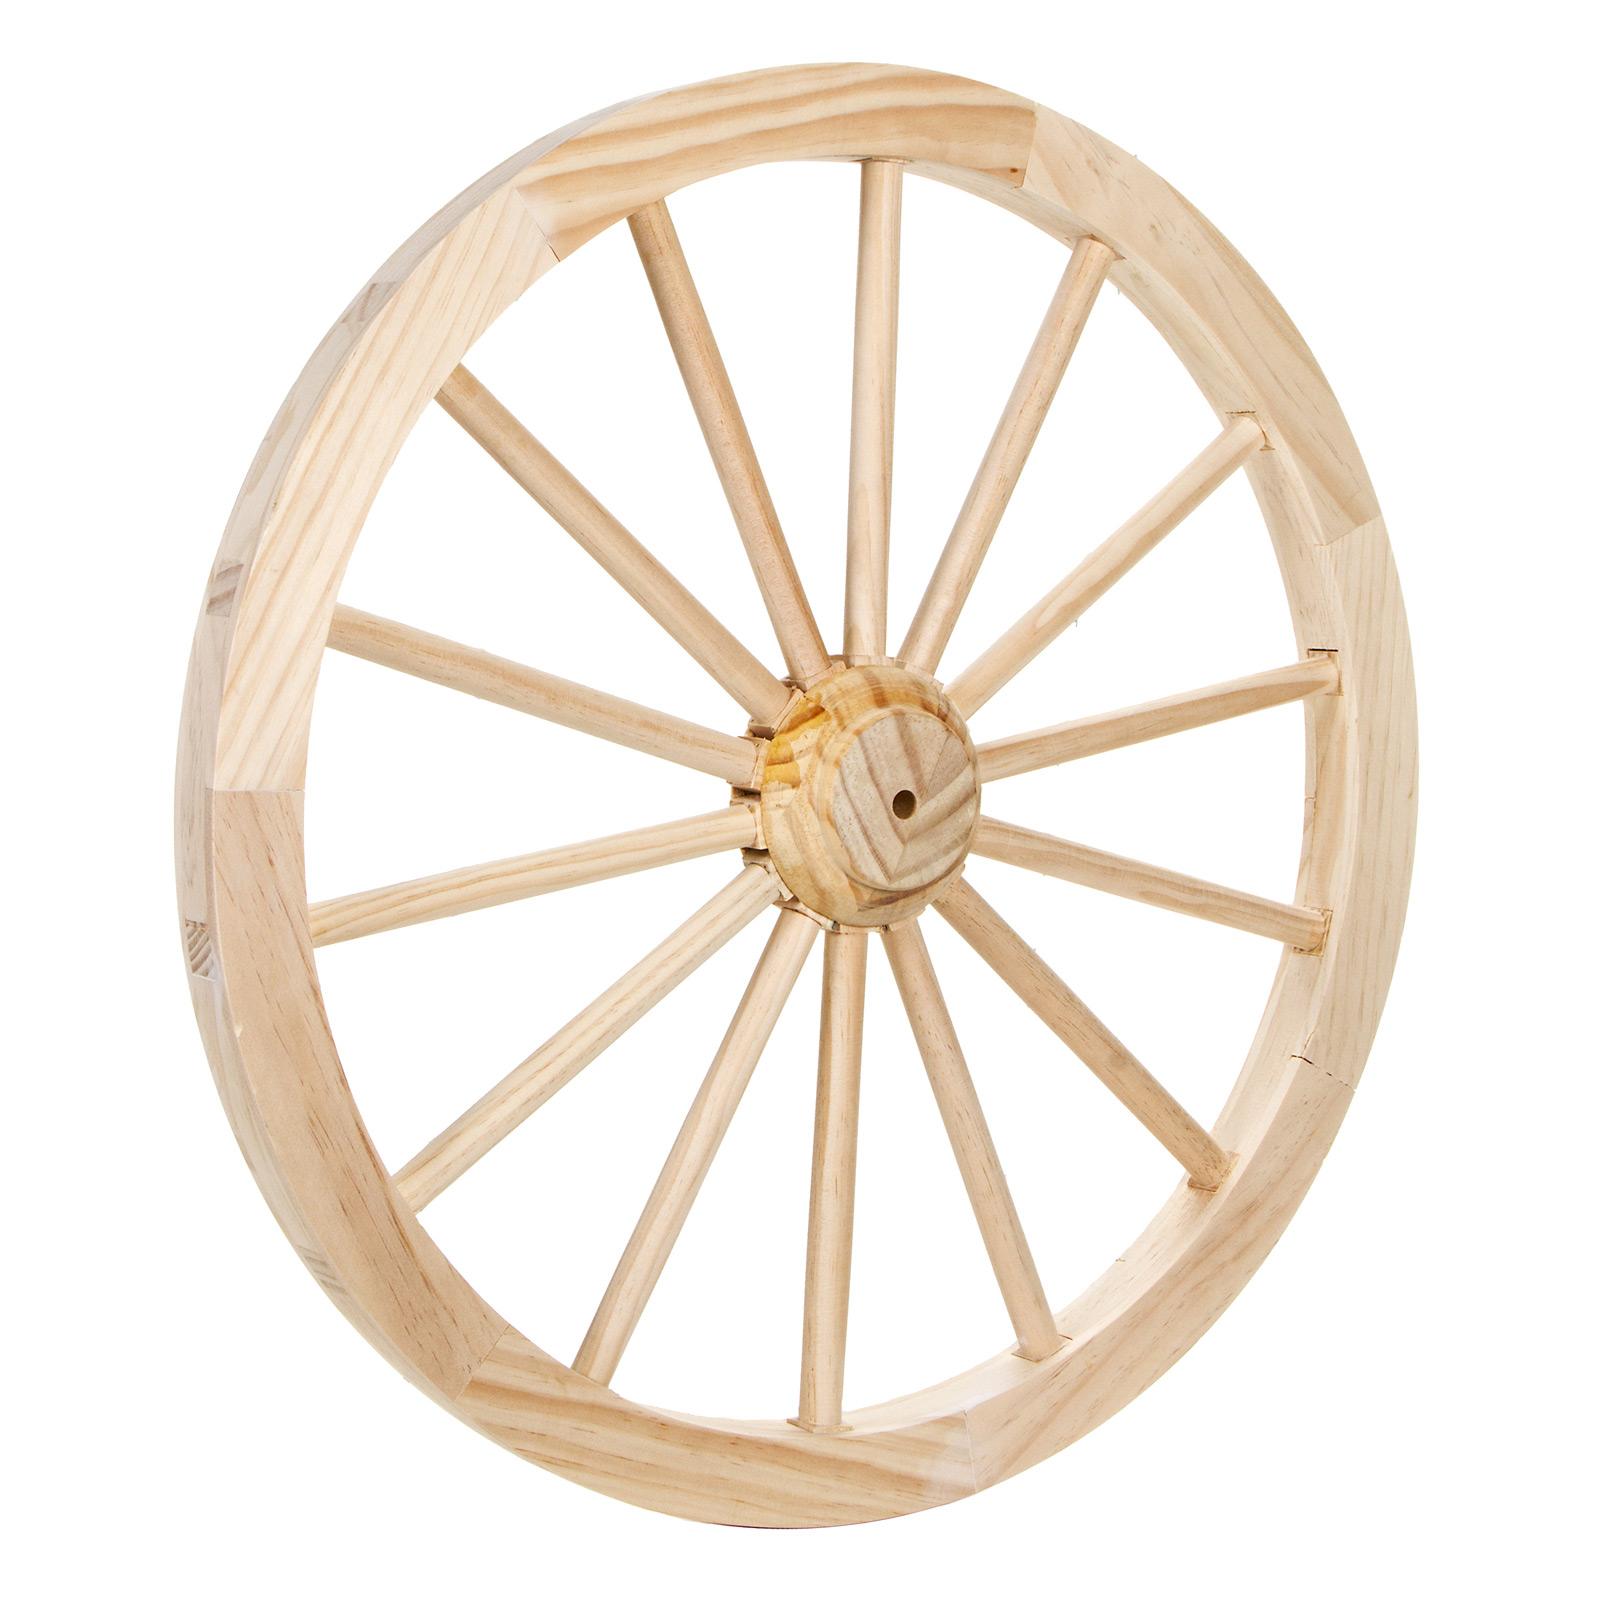 1600x1600 Unfinished Wood Decorative Wagon Wheels 23.5 Inches